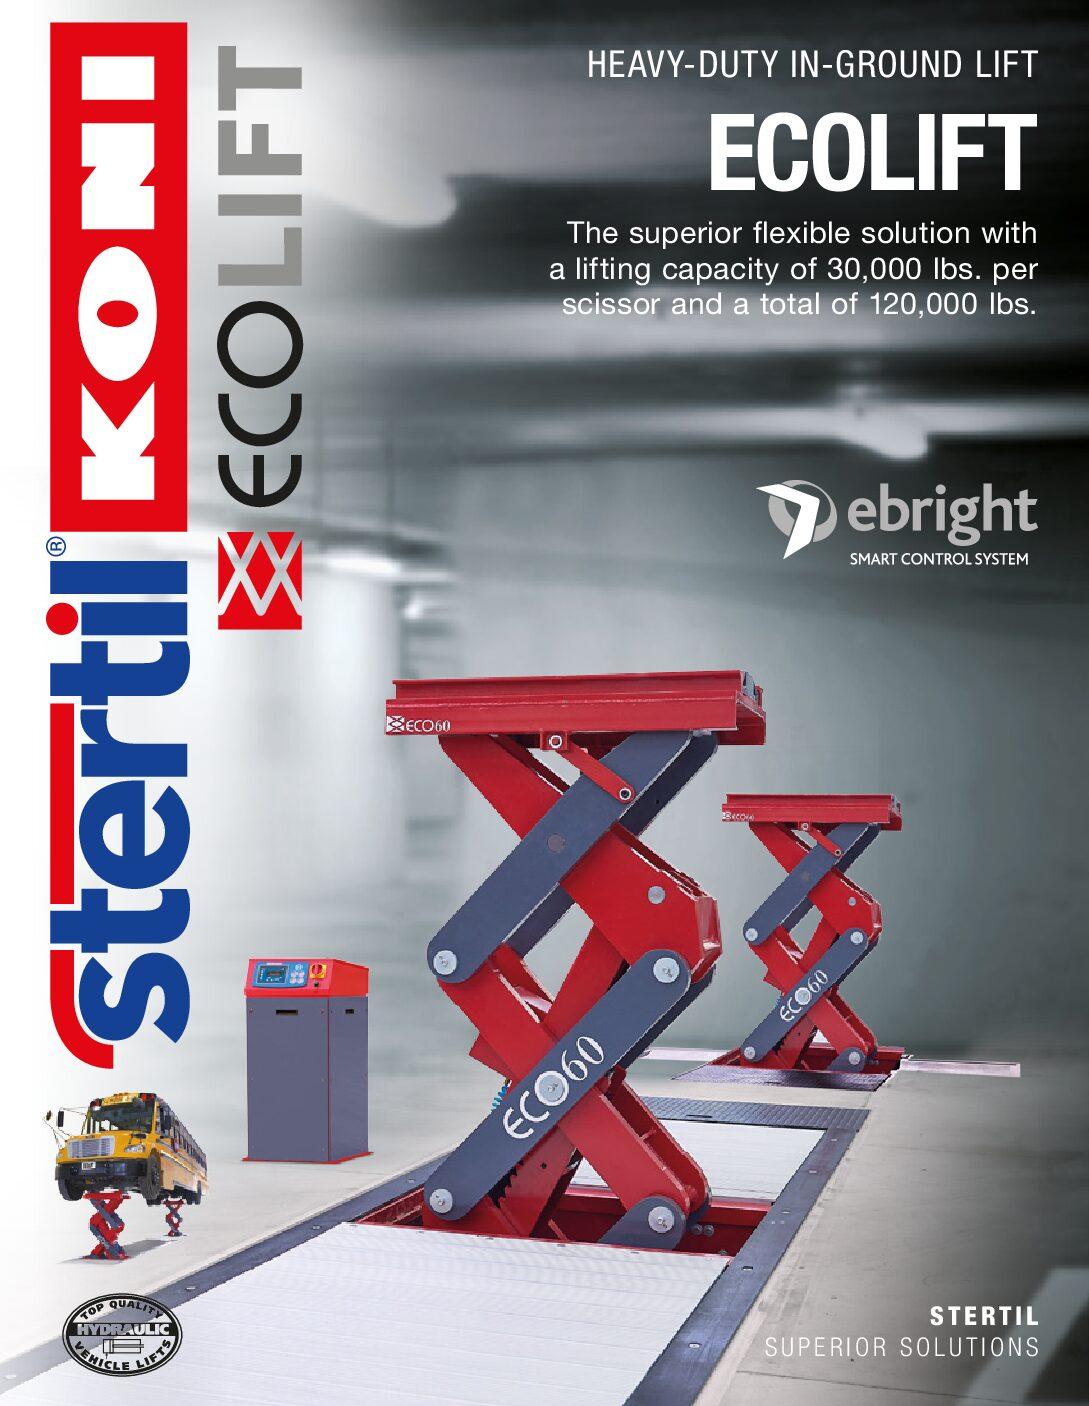 Stertil-Koni: ECOLIFT – US Version